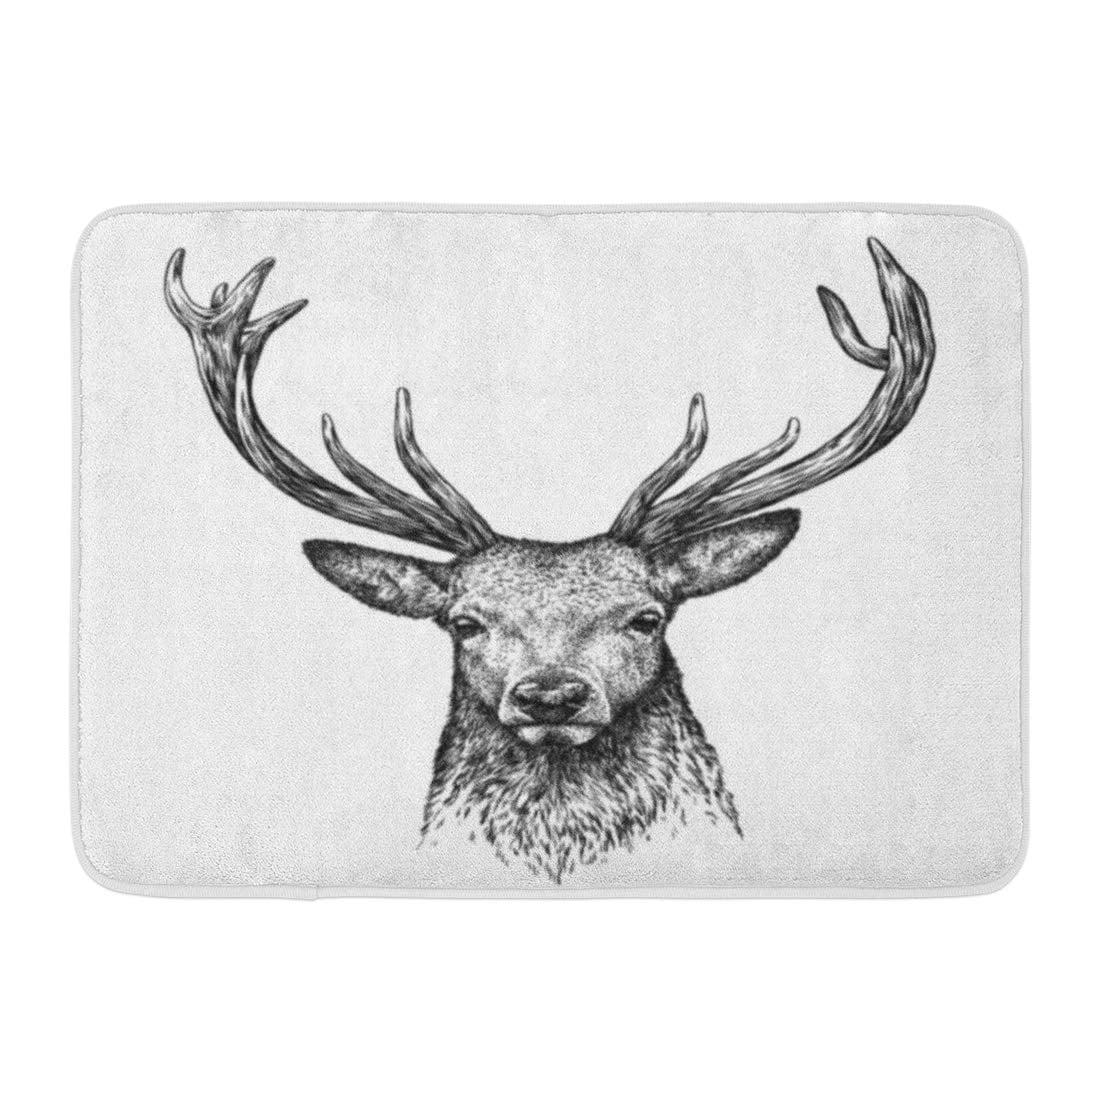 GODPOK Sketch Brown Stag Black And White Engrave Deer Head